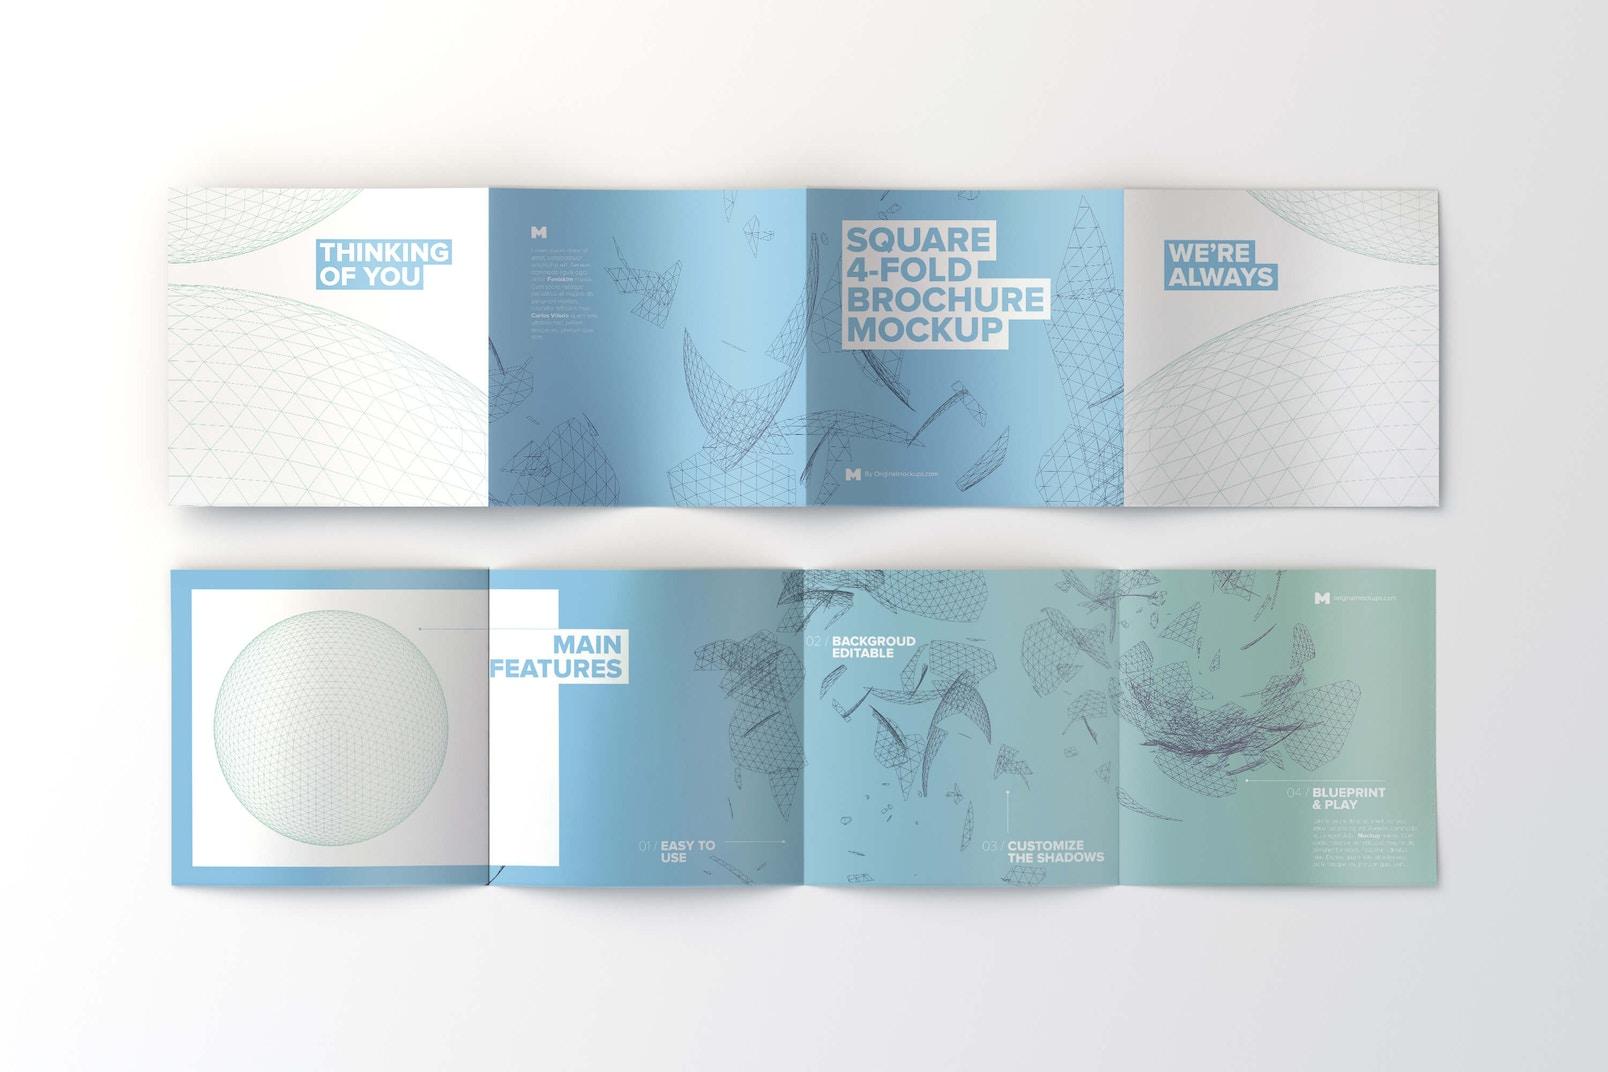 Spread Square 4-Fold Brochure Outside and Inside Mockup 02